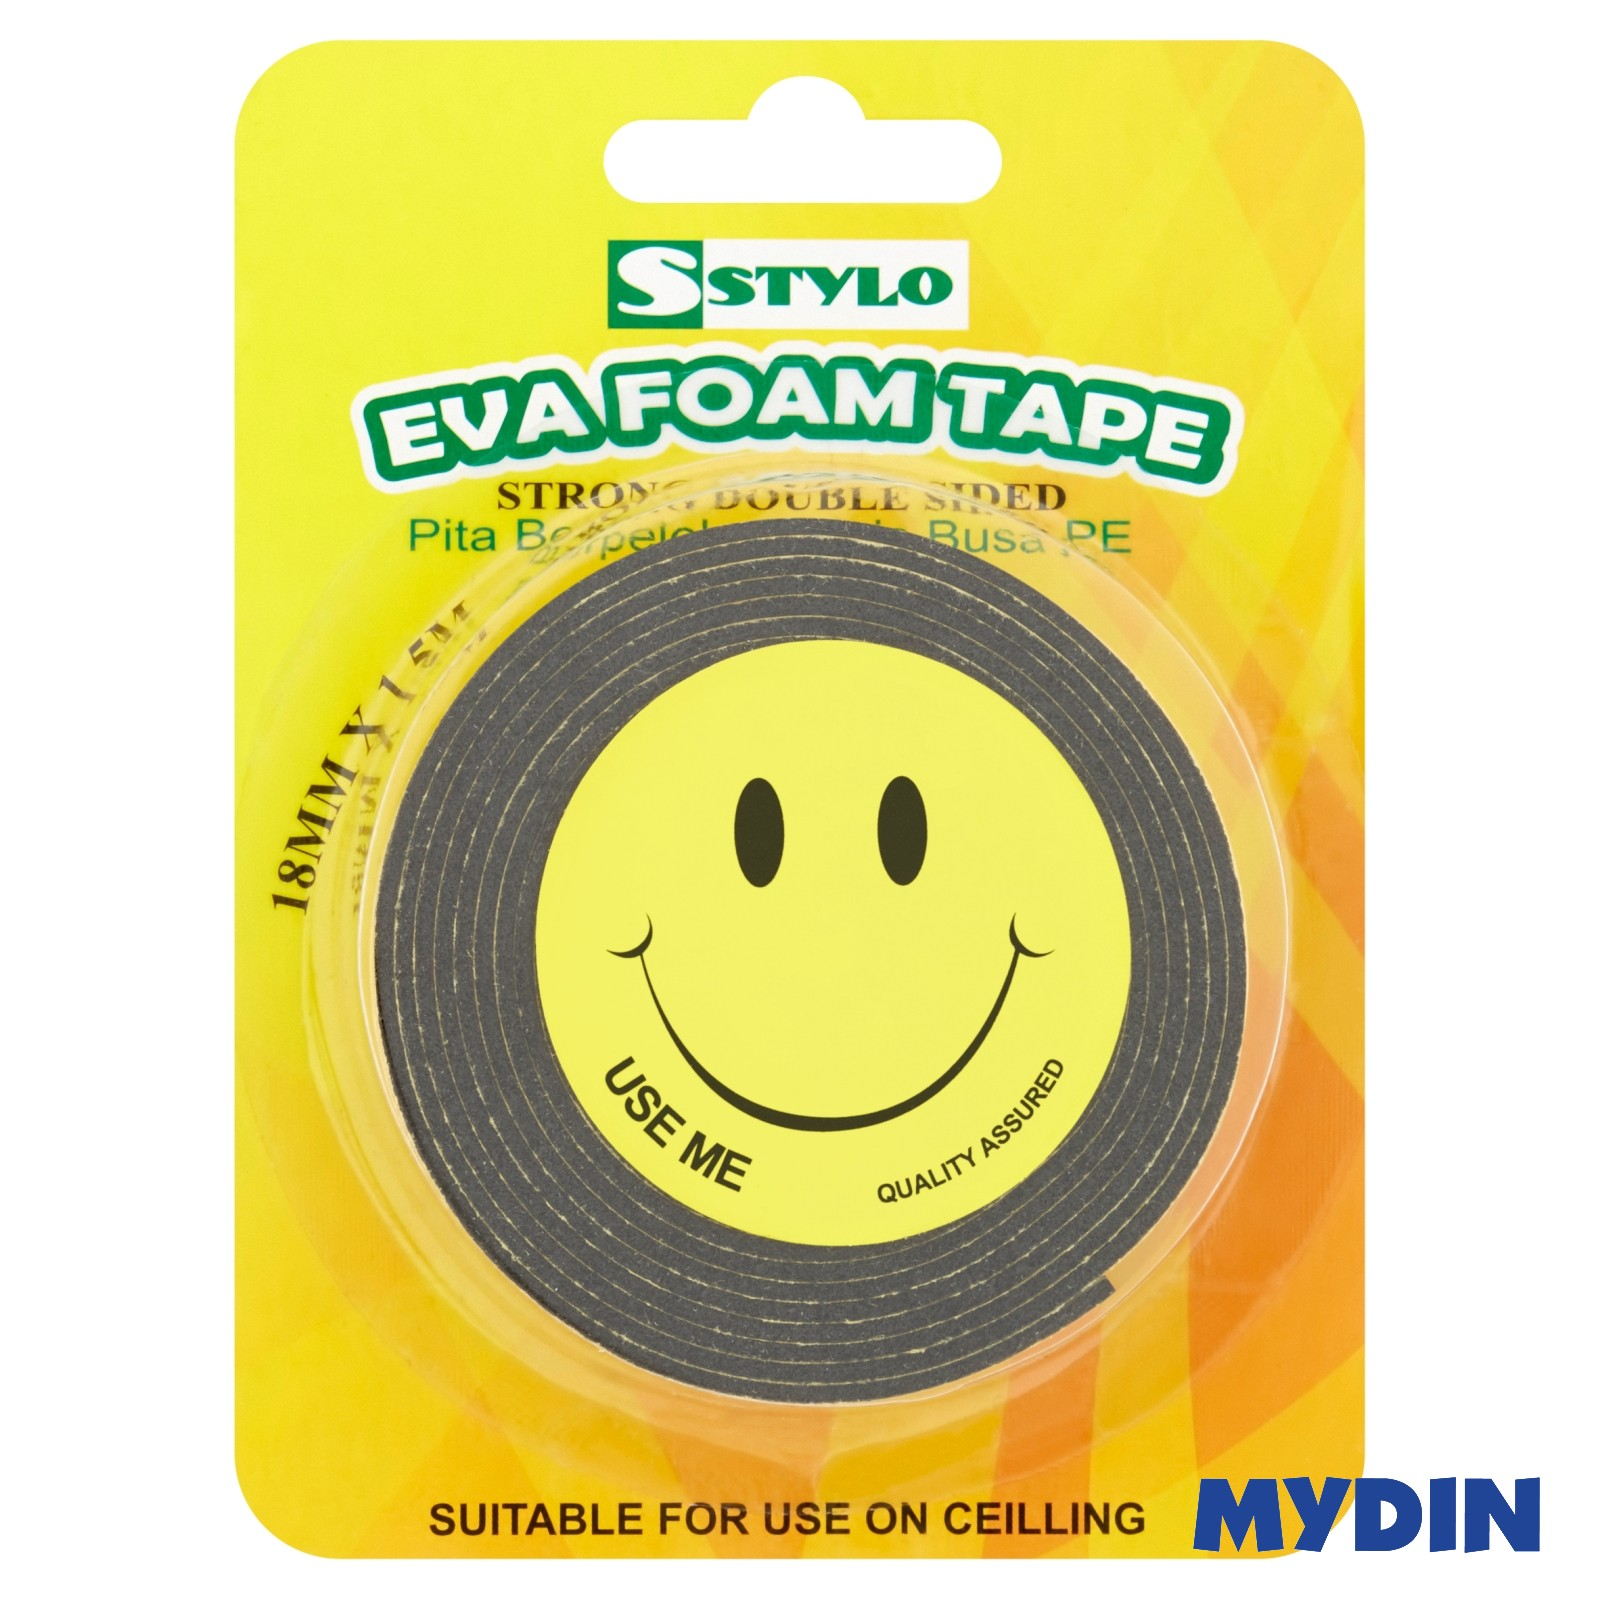 Stylo Eva Foam Tape 18mm x 1.5m